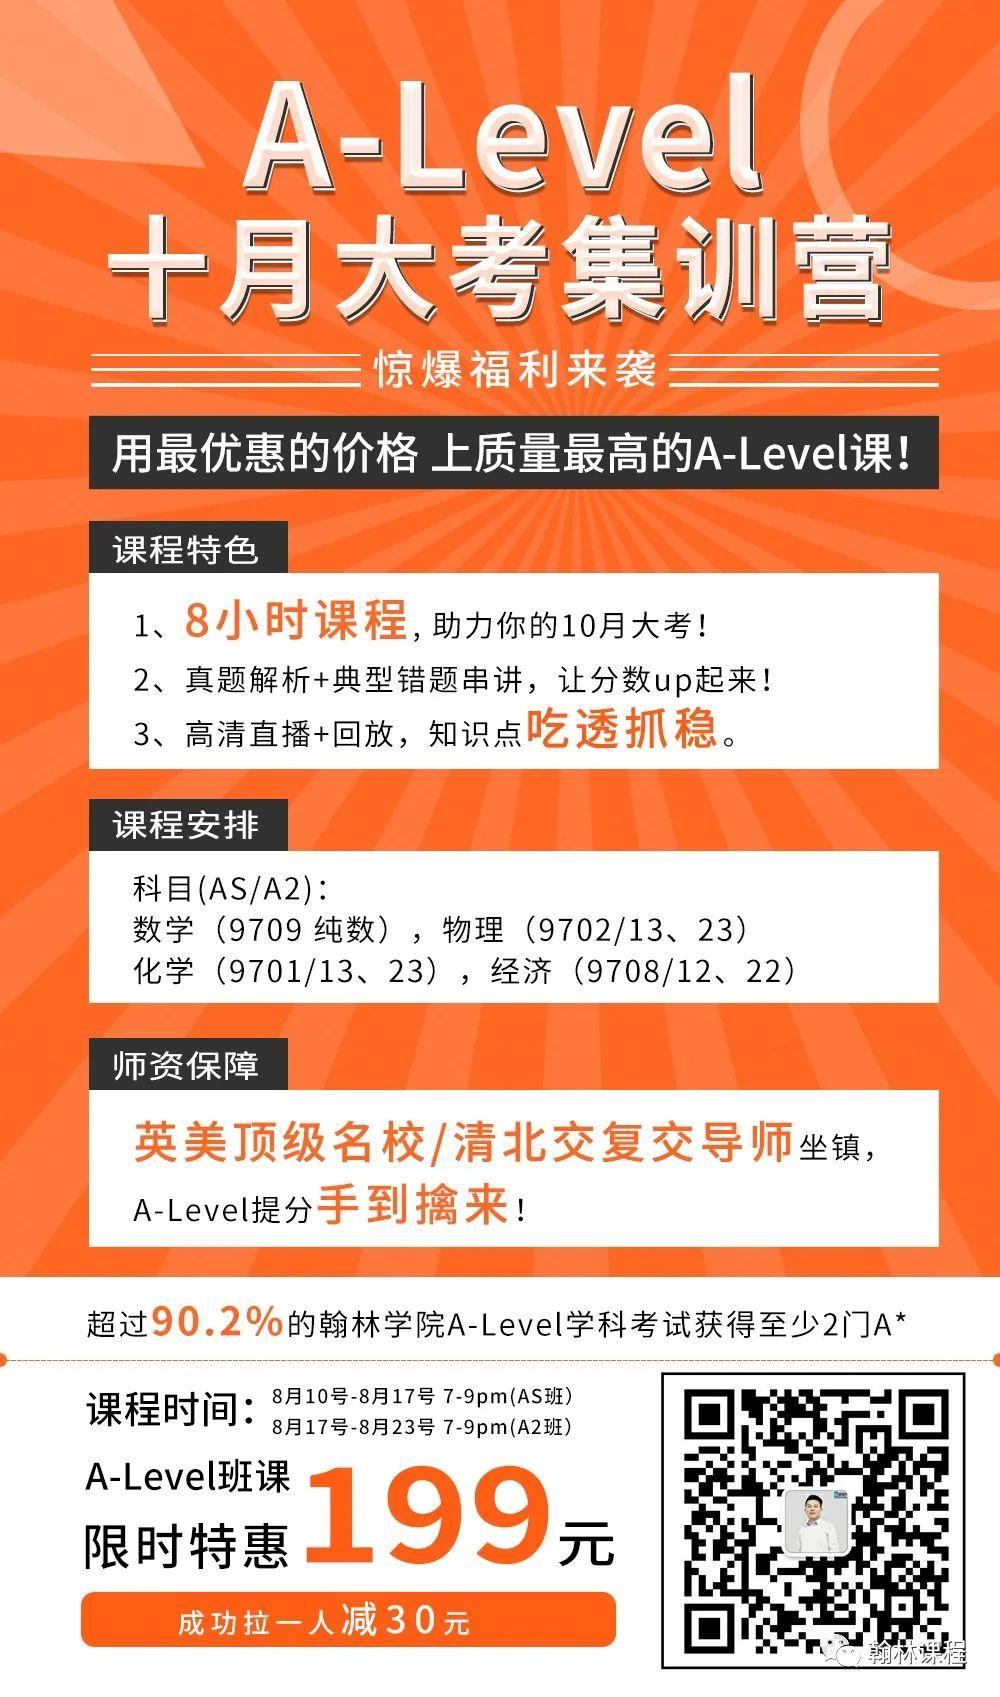 A-Level考试时间公布!今年的A-Level考试,你准备好了吗?